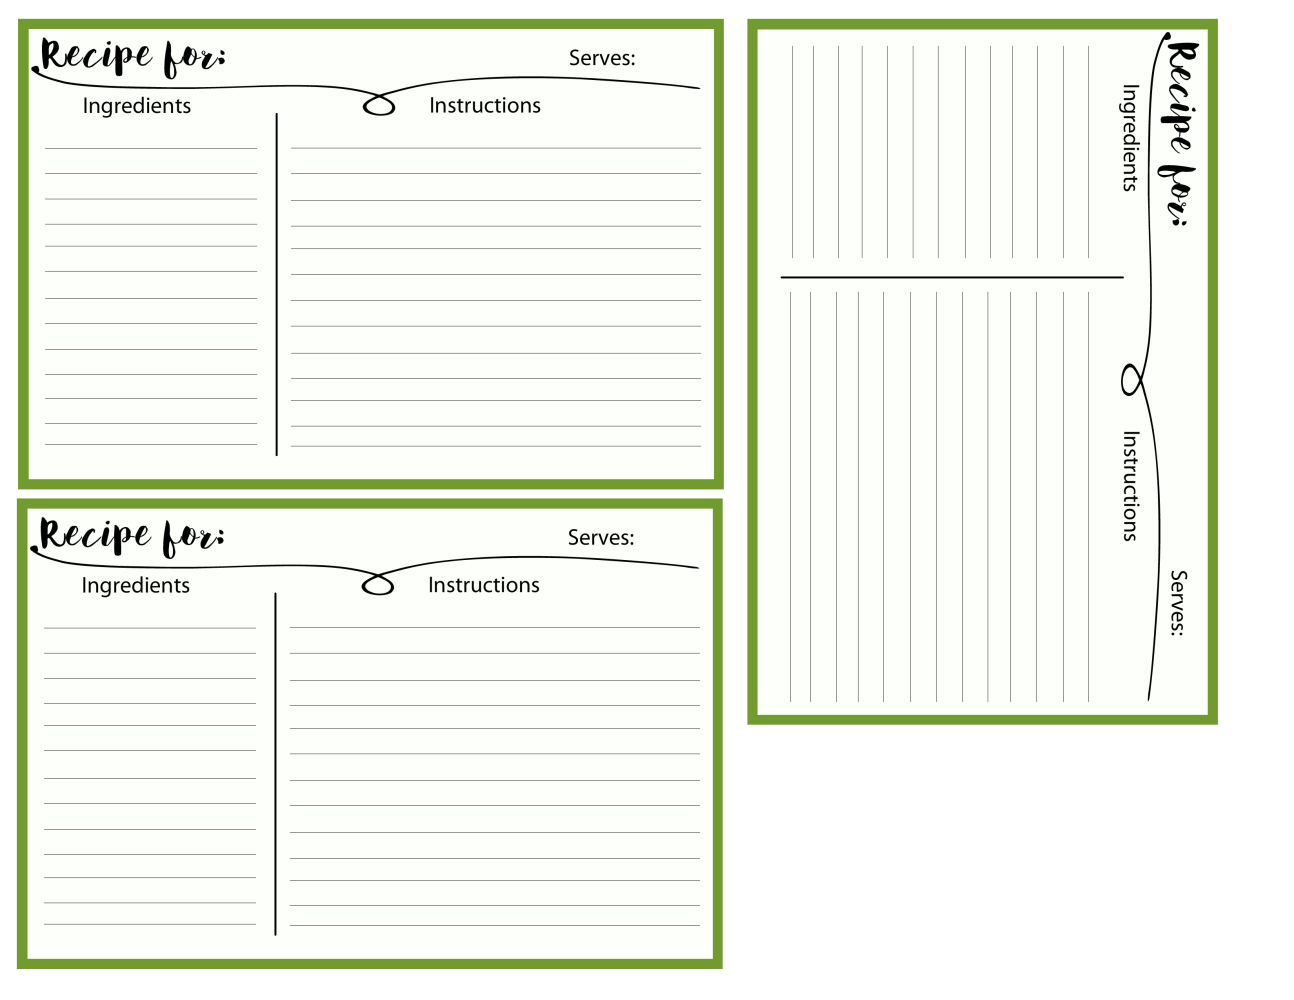 Michelle - Jan 12 - Recipe Card Organization - Pic 7